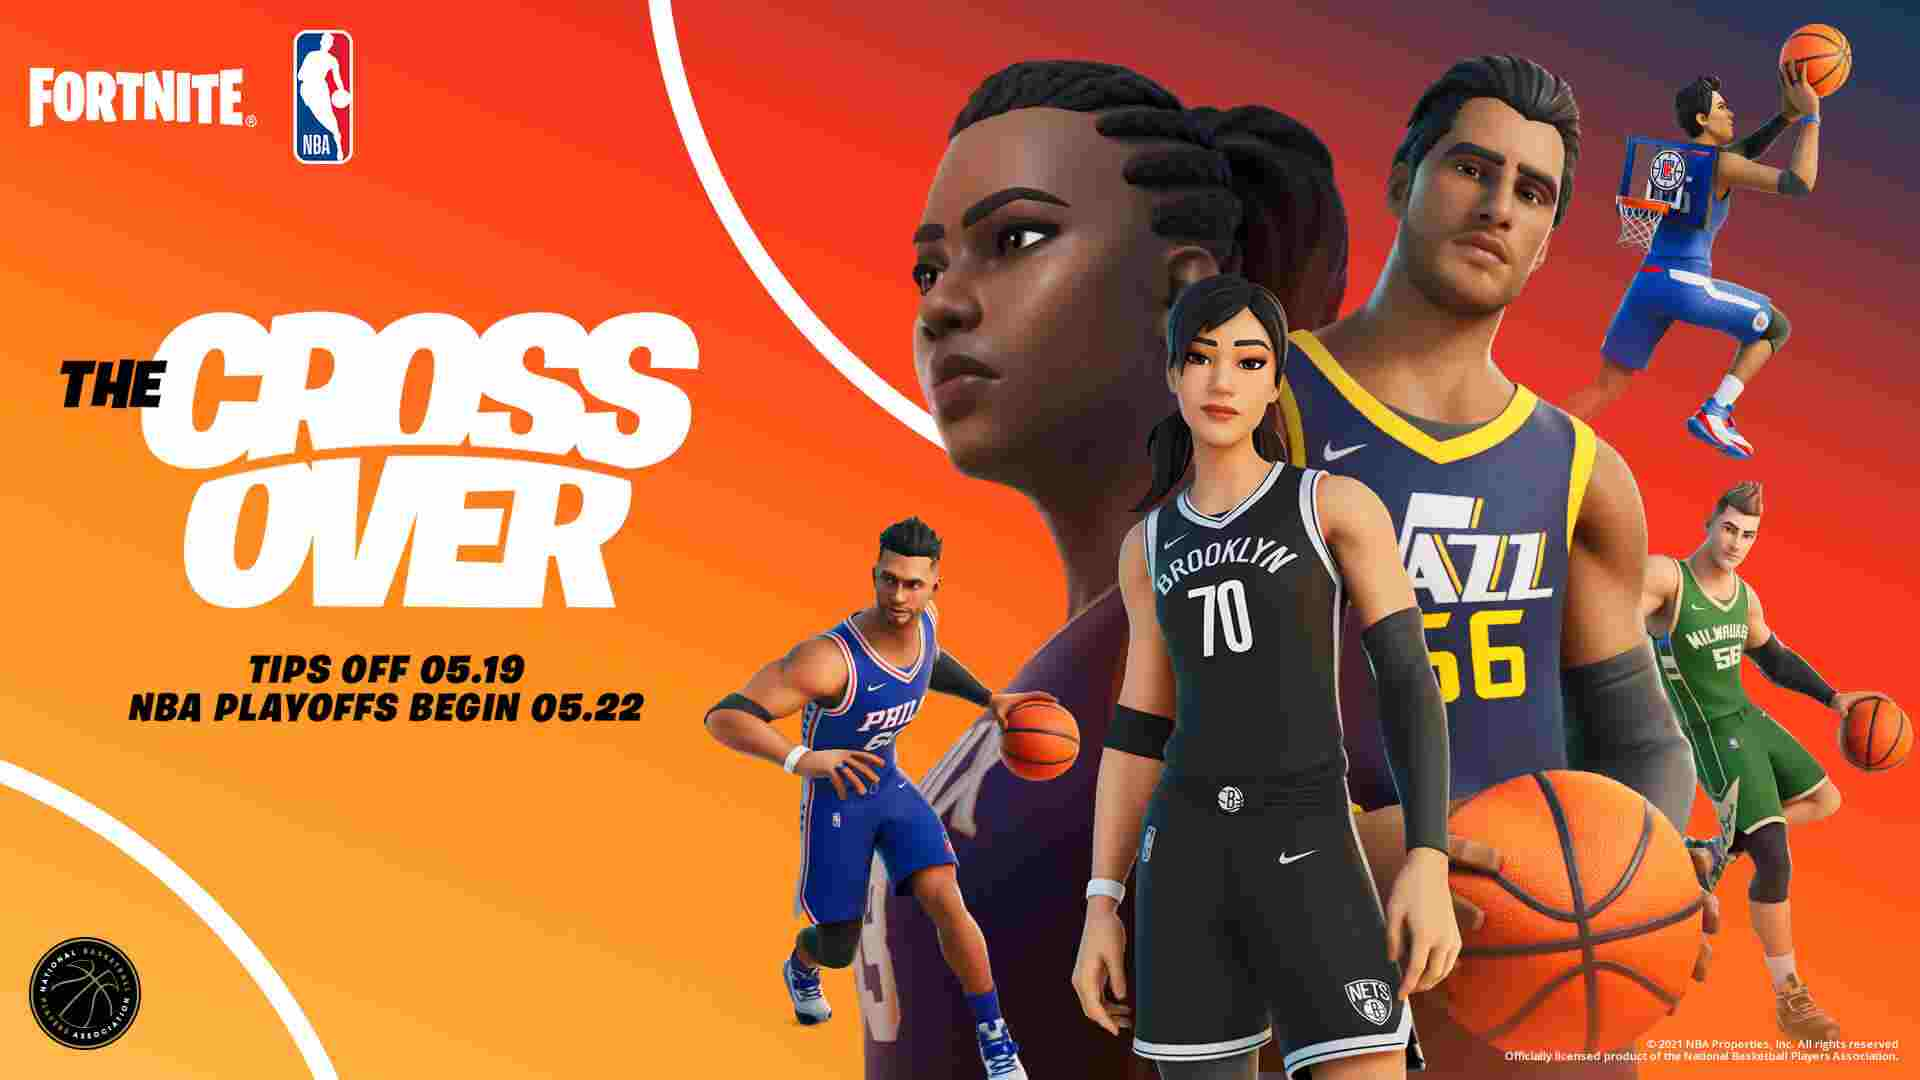 Fortnite x NBA Battles Team Crossover